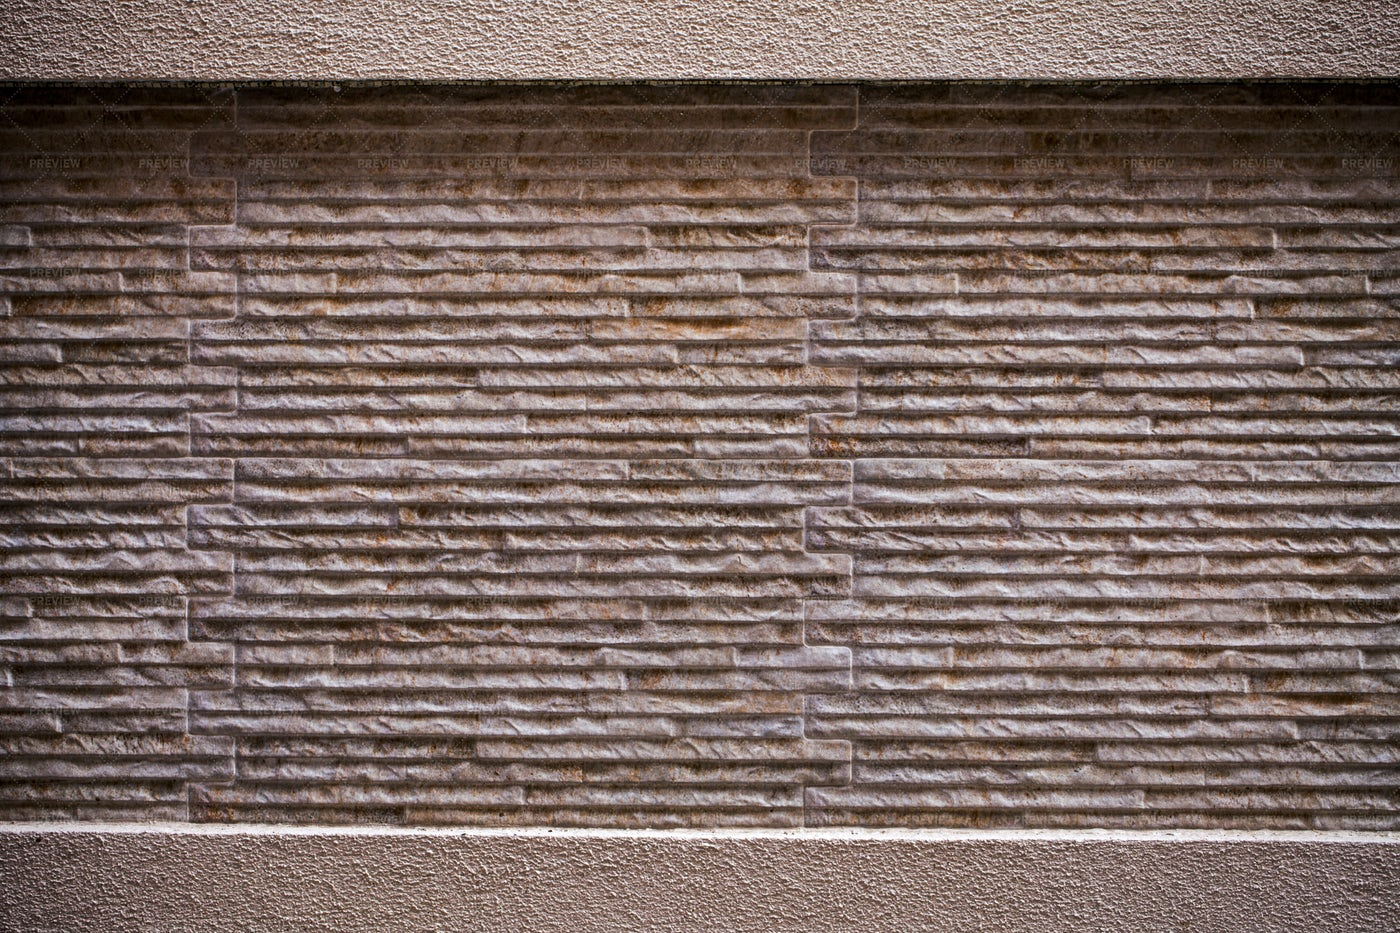 Modern Stone Brick Wall: Stock Photos